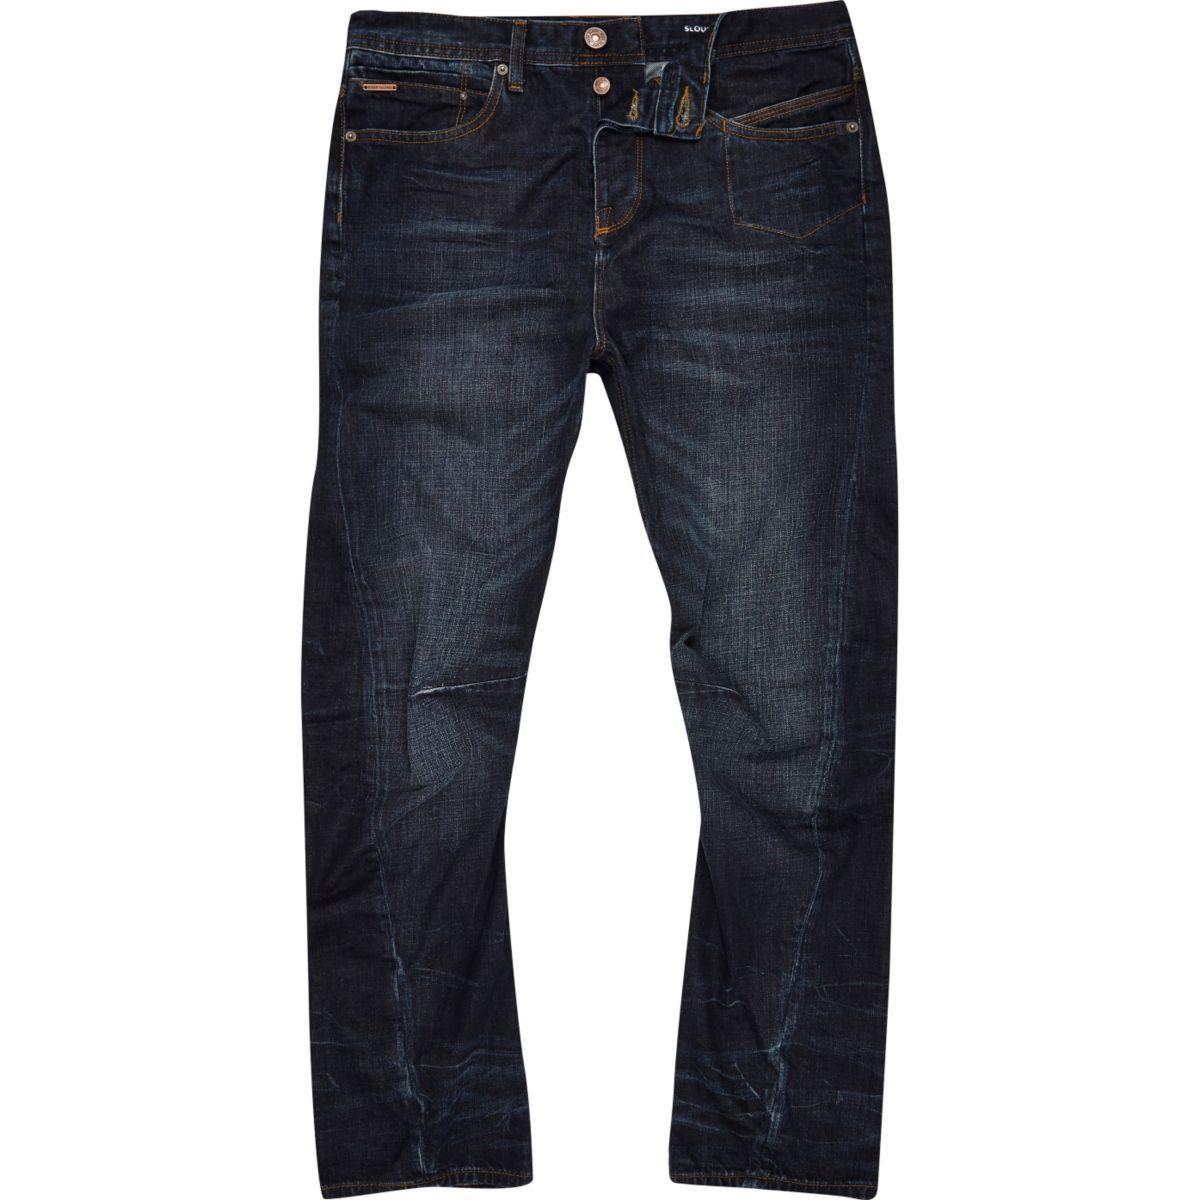 Curtis – Dunkelblaue Loose Fit Jeans